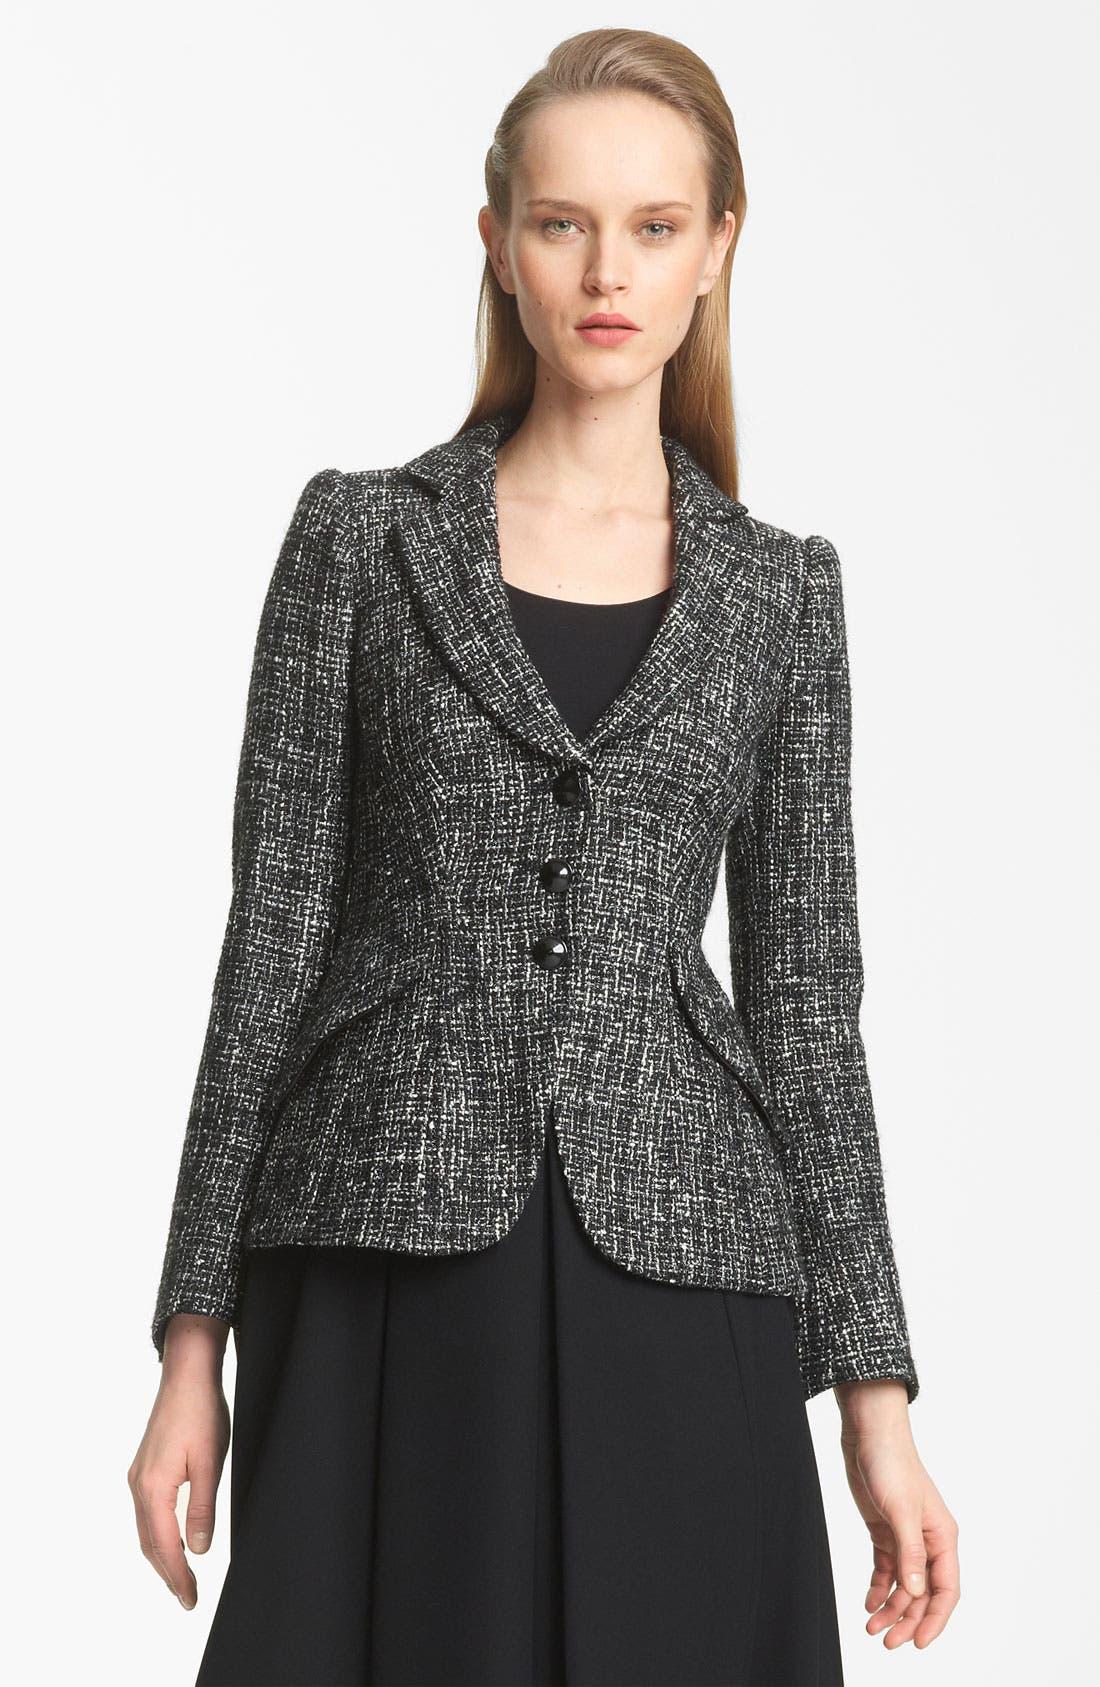 Alternate Image 1 Selected - Armani Collezioni Tweed Jacket